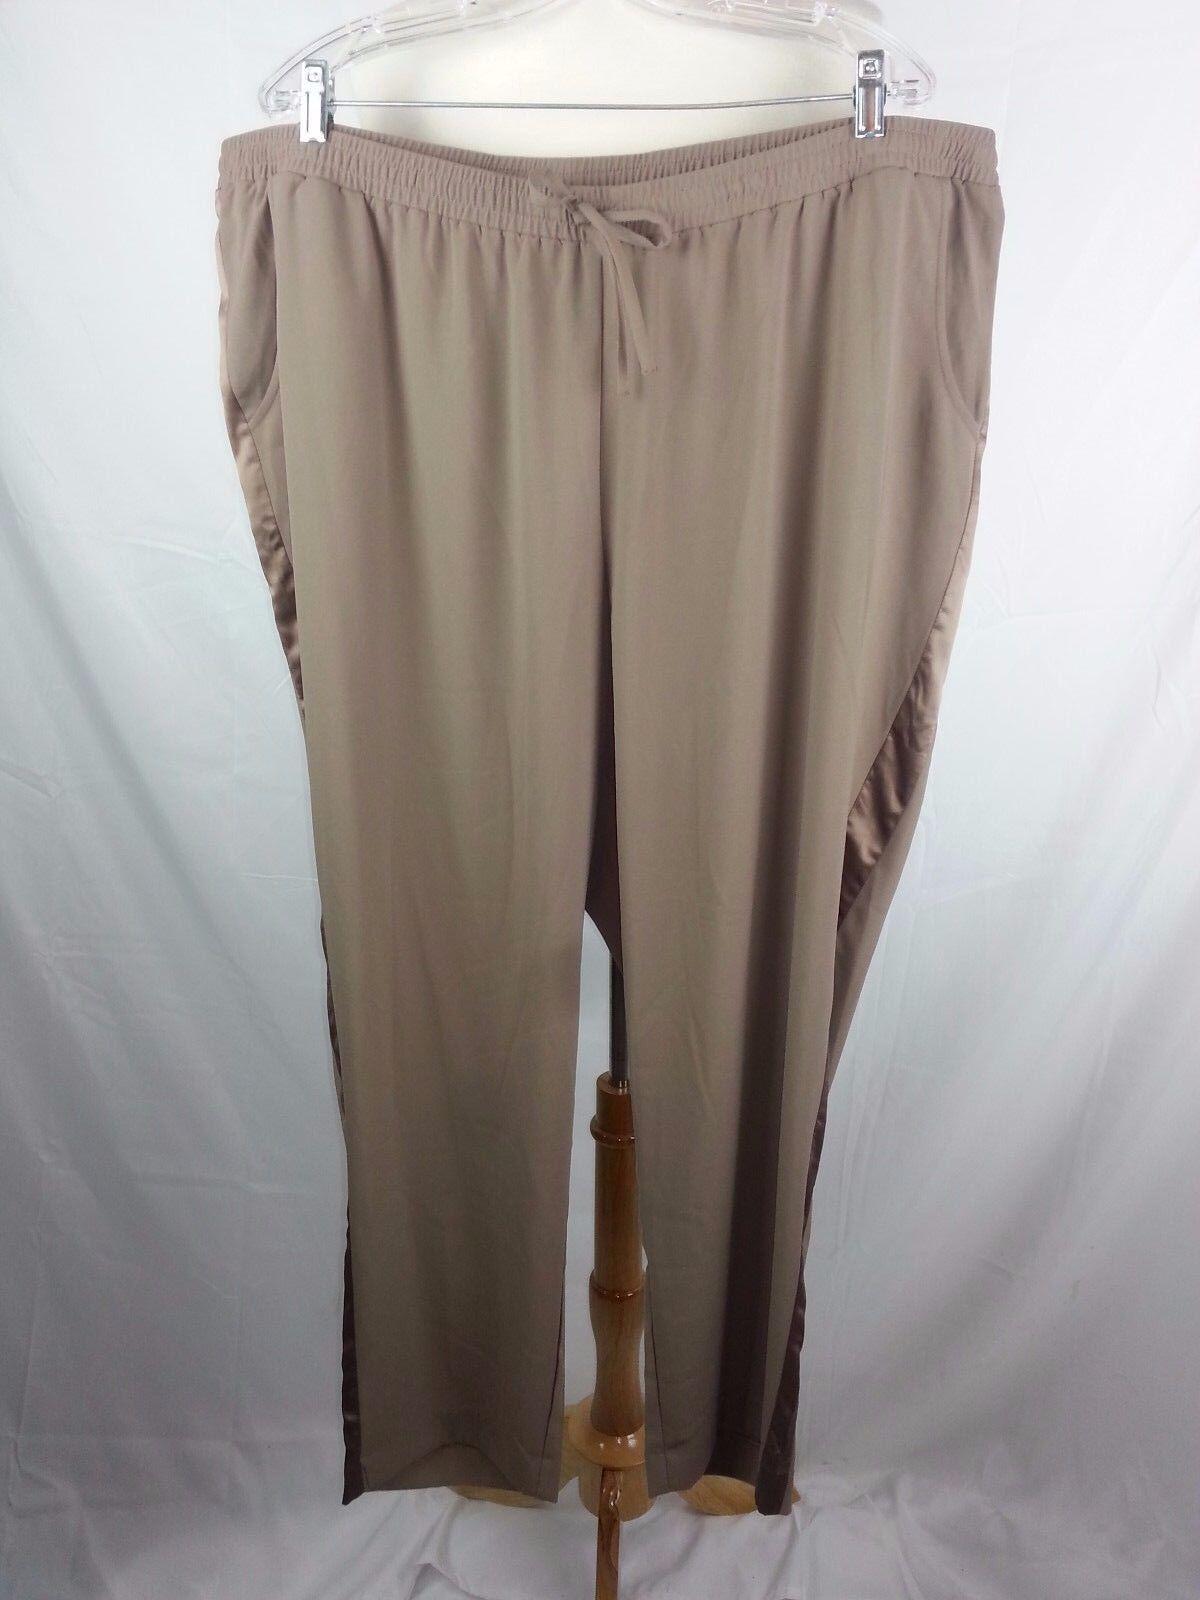 LANE BRYANT WOMEN'S PLUS SZ 22   24 Taupe Pull On PANTS 44 x 29 Side Stripes